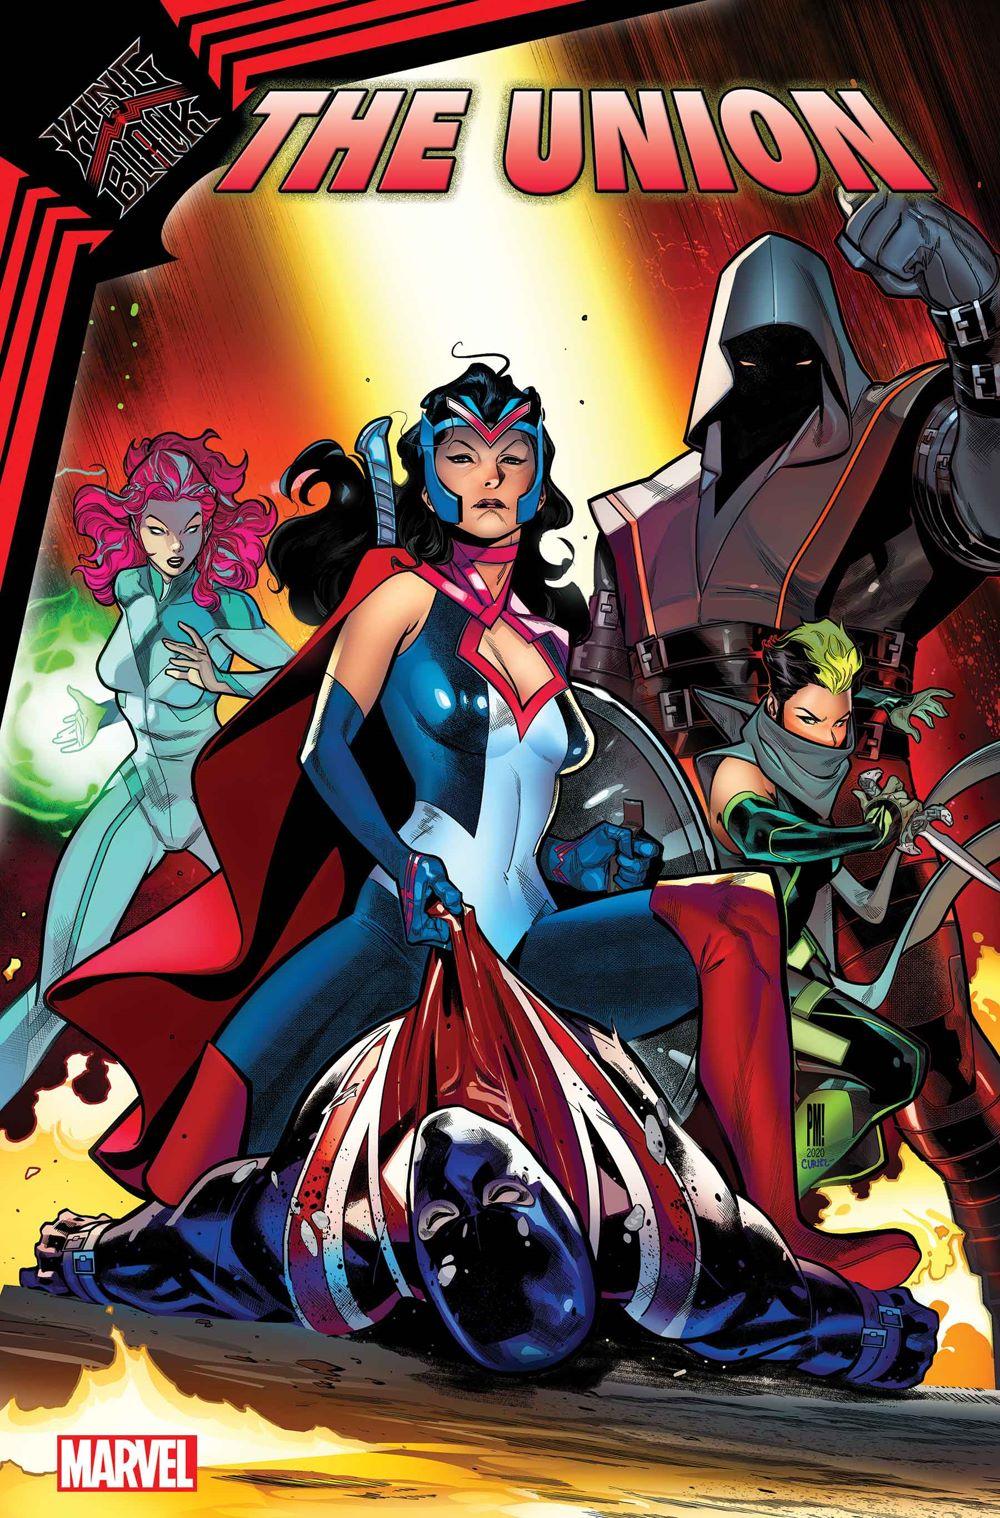 UNION2020002_cvr Marvel Comics January 2021 Solicitations